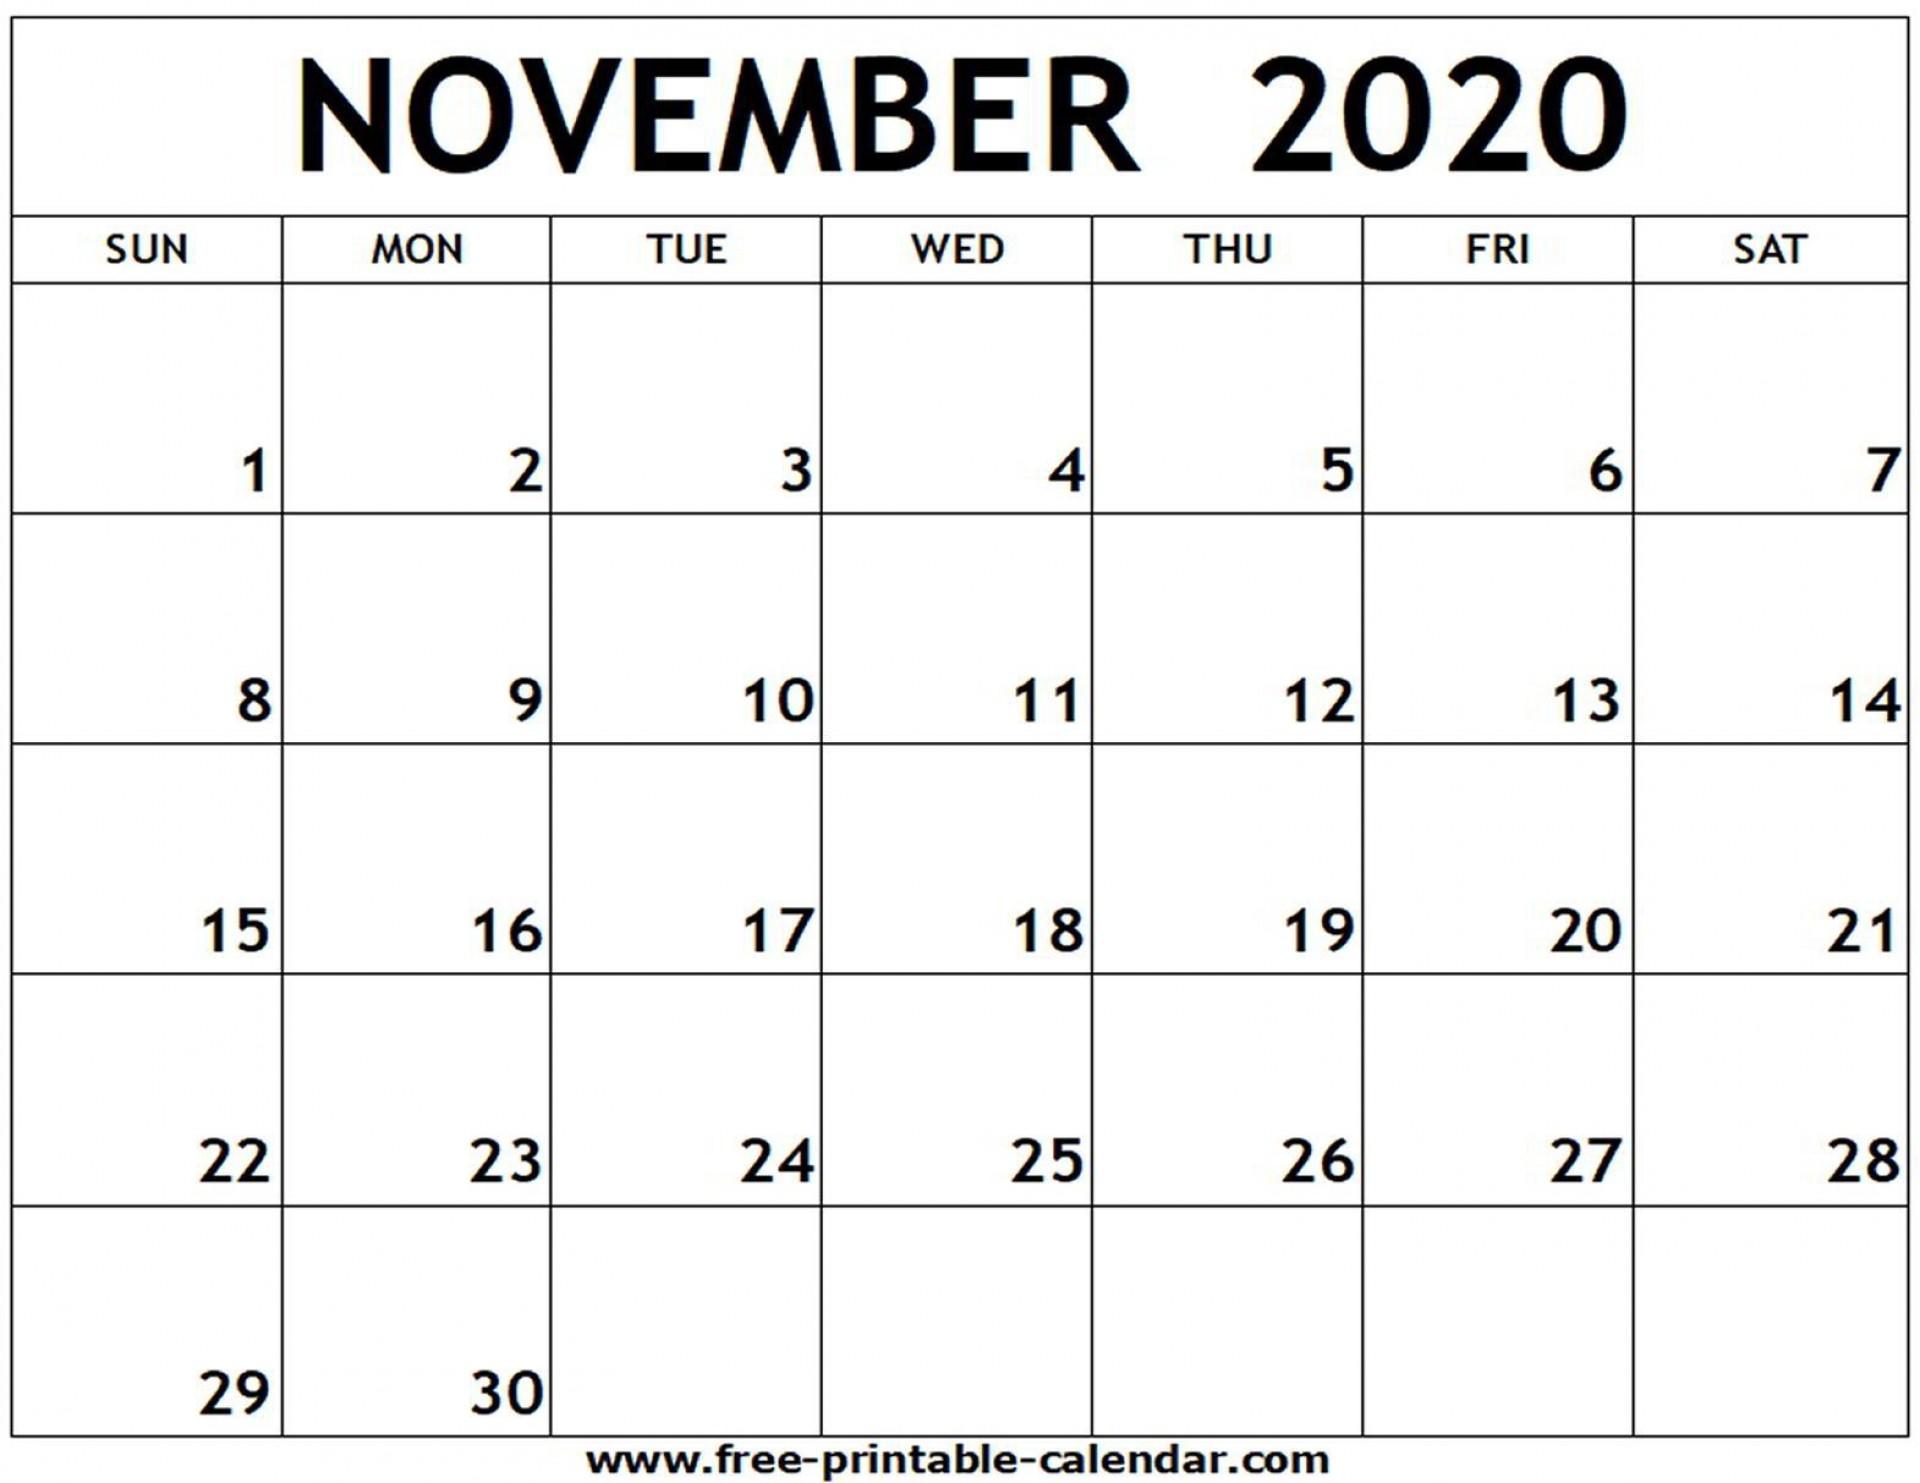 009 Stunning Printable Calendar Template November 2020 Picture  Free1920